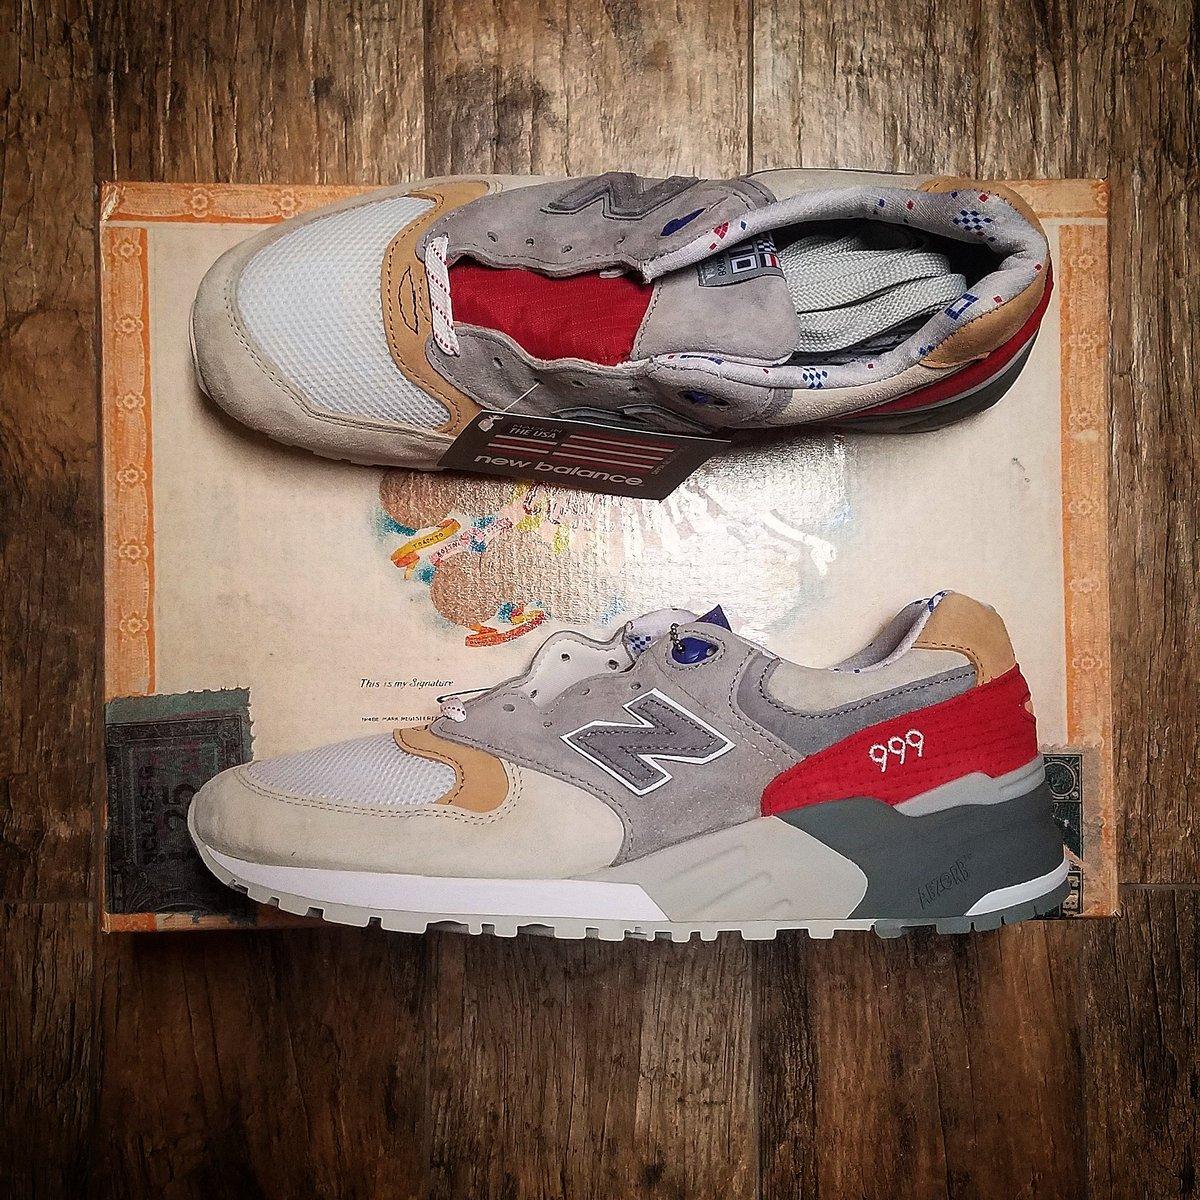 huge discount 0e99b f4fc4 Wolfpack Sneakers on Twitter: